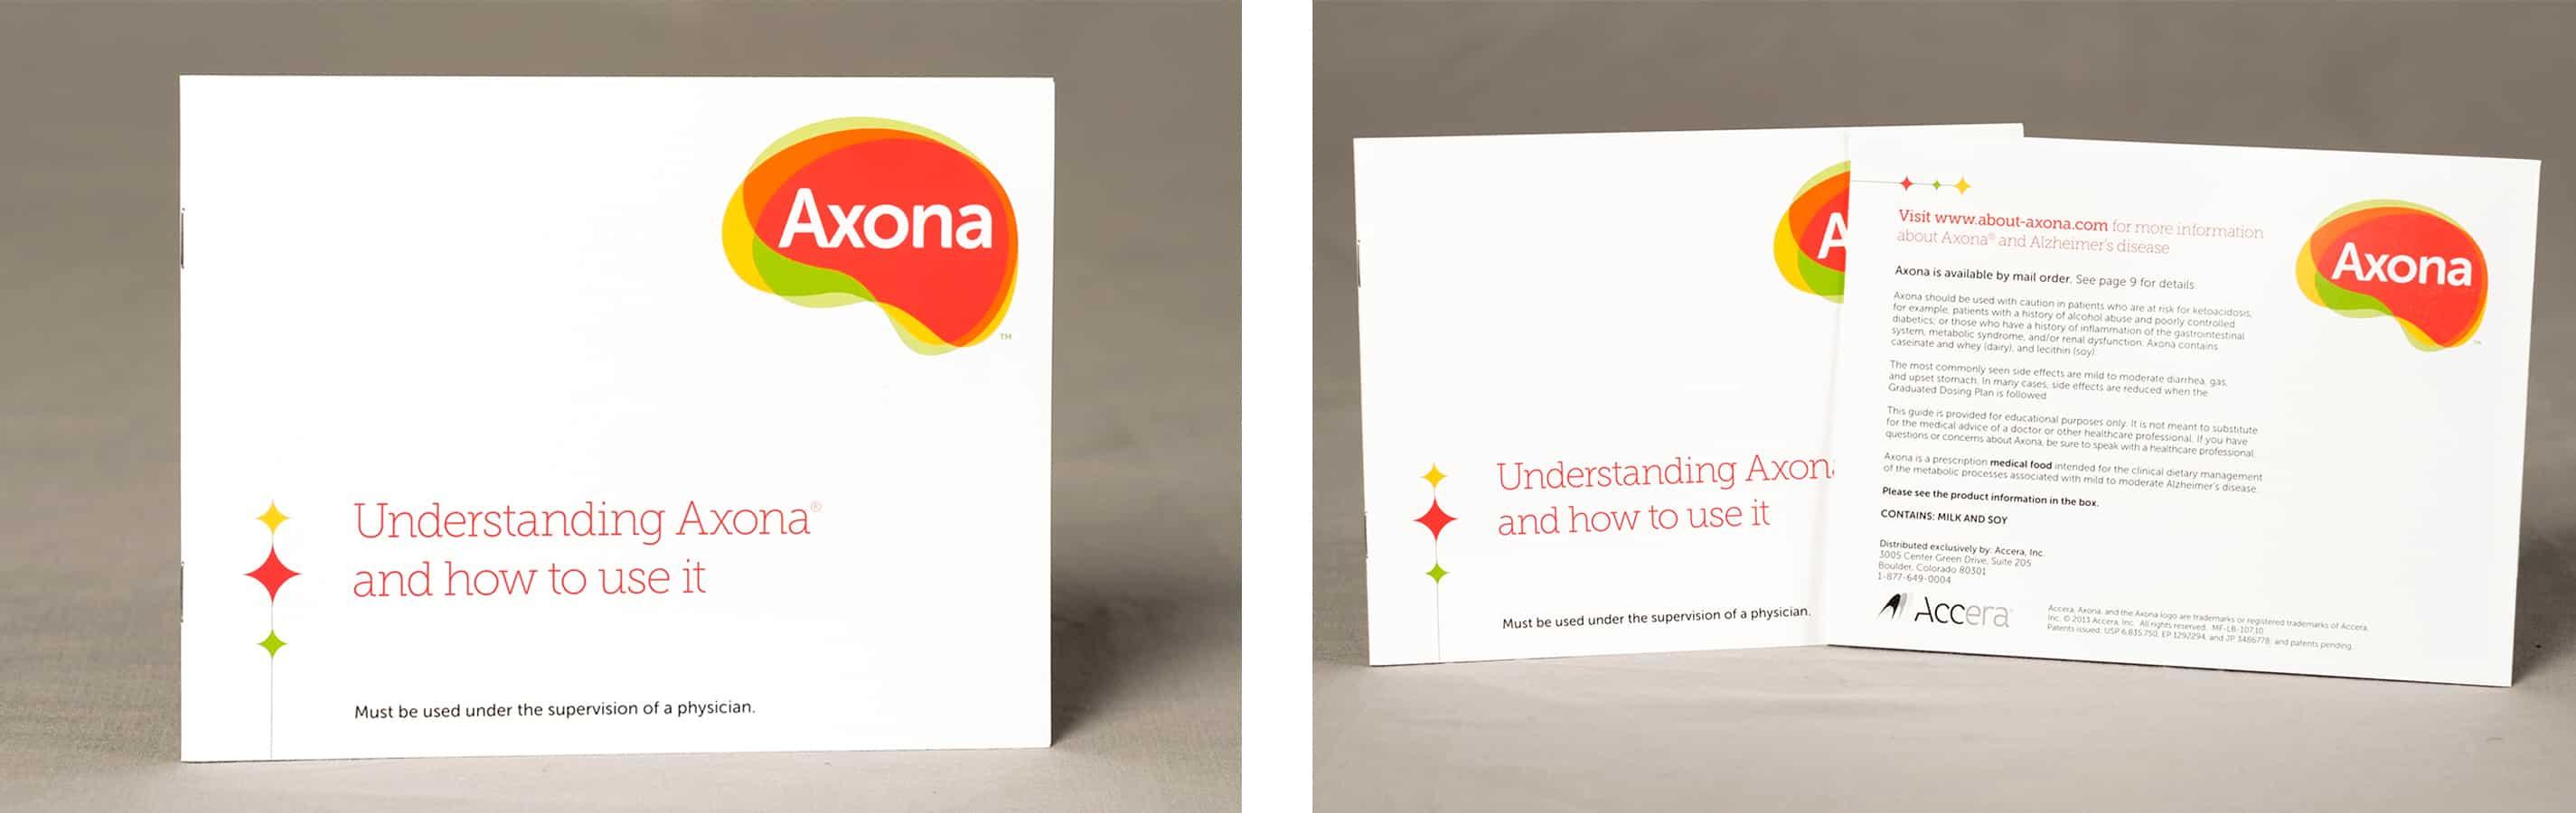 Folded printing package insert for Axona.